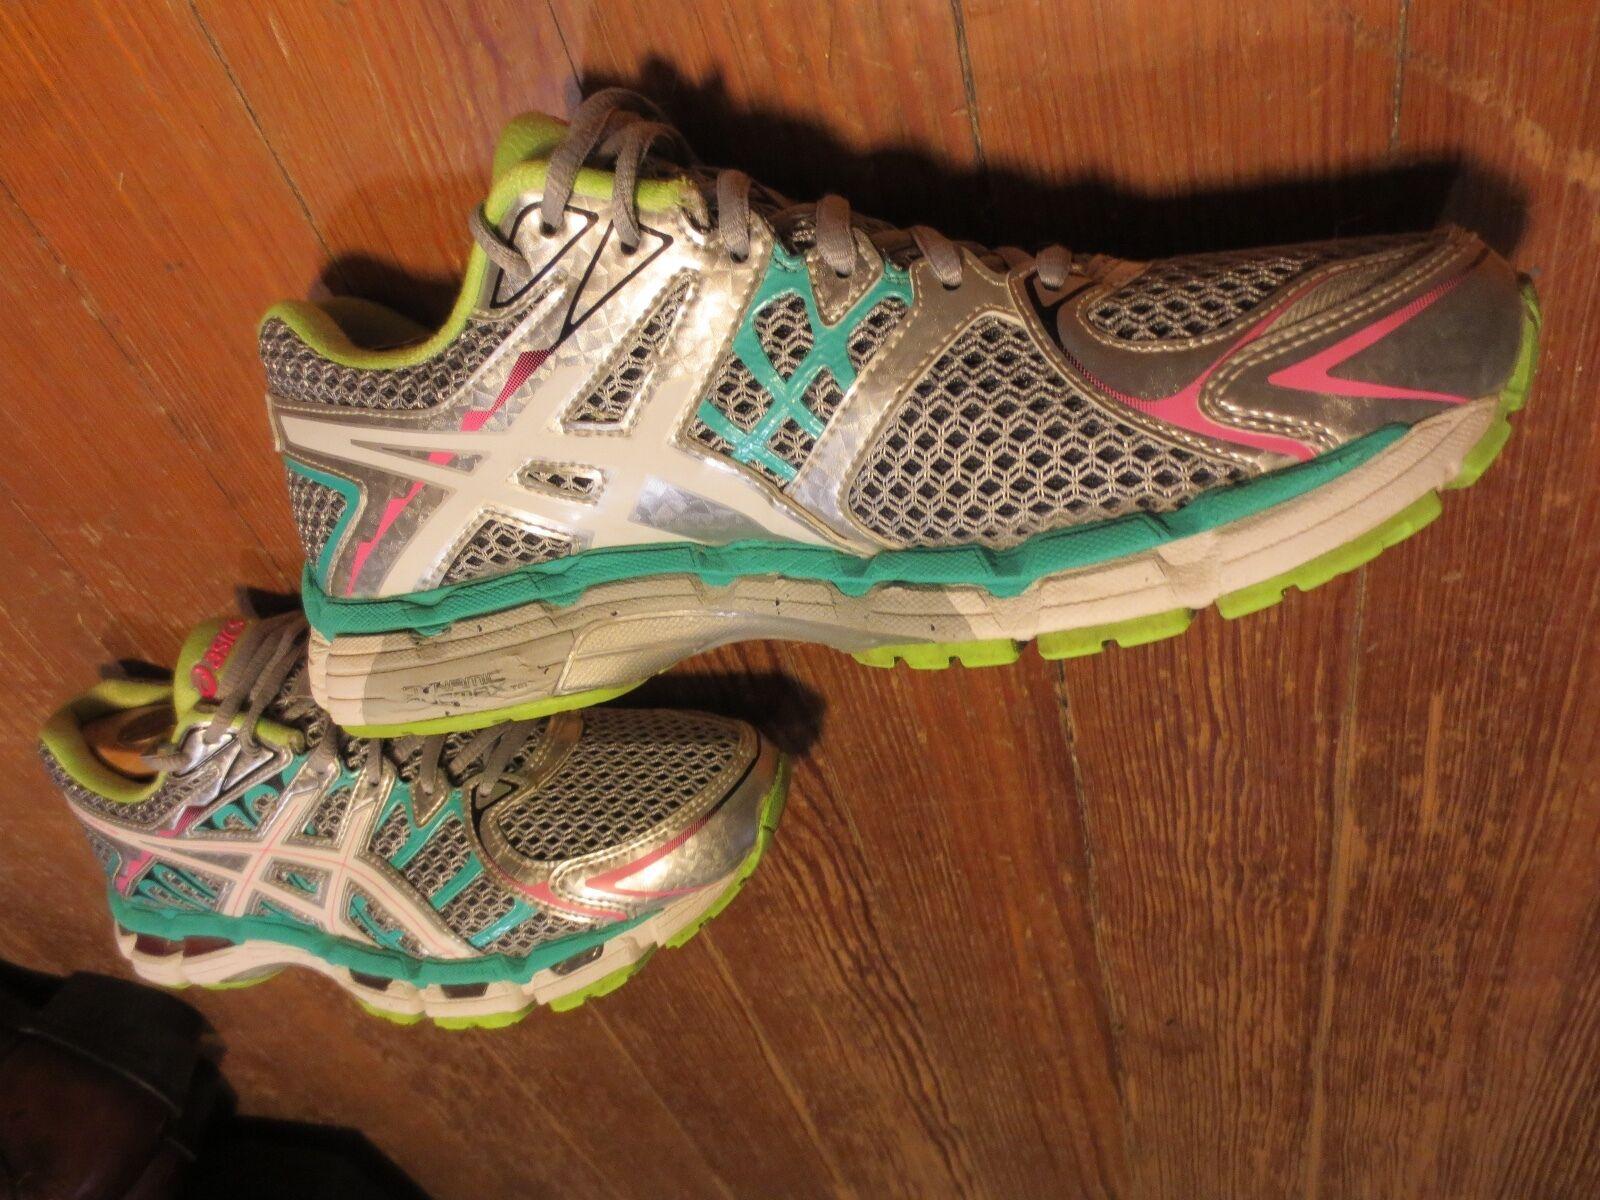 ASICS Gel Surveyor 2 Running Shoe - Titanium/White/Sharp Green Womens Sz 9 The most popular shoes for men and women